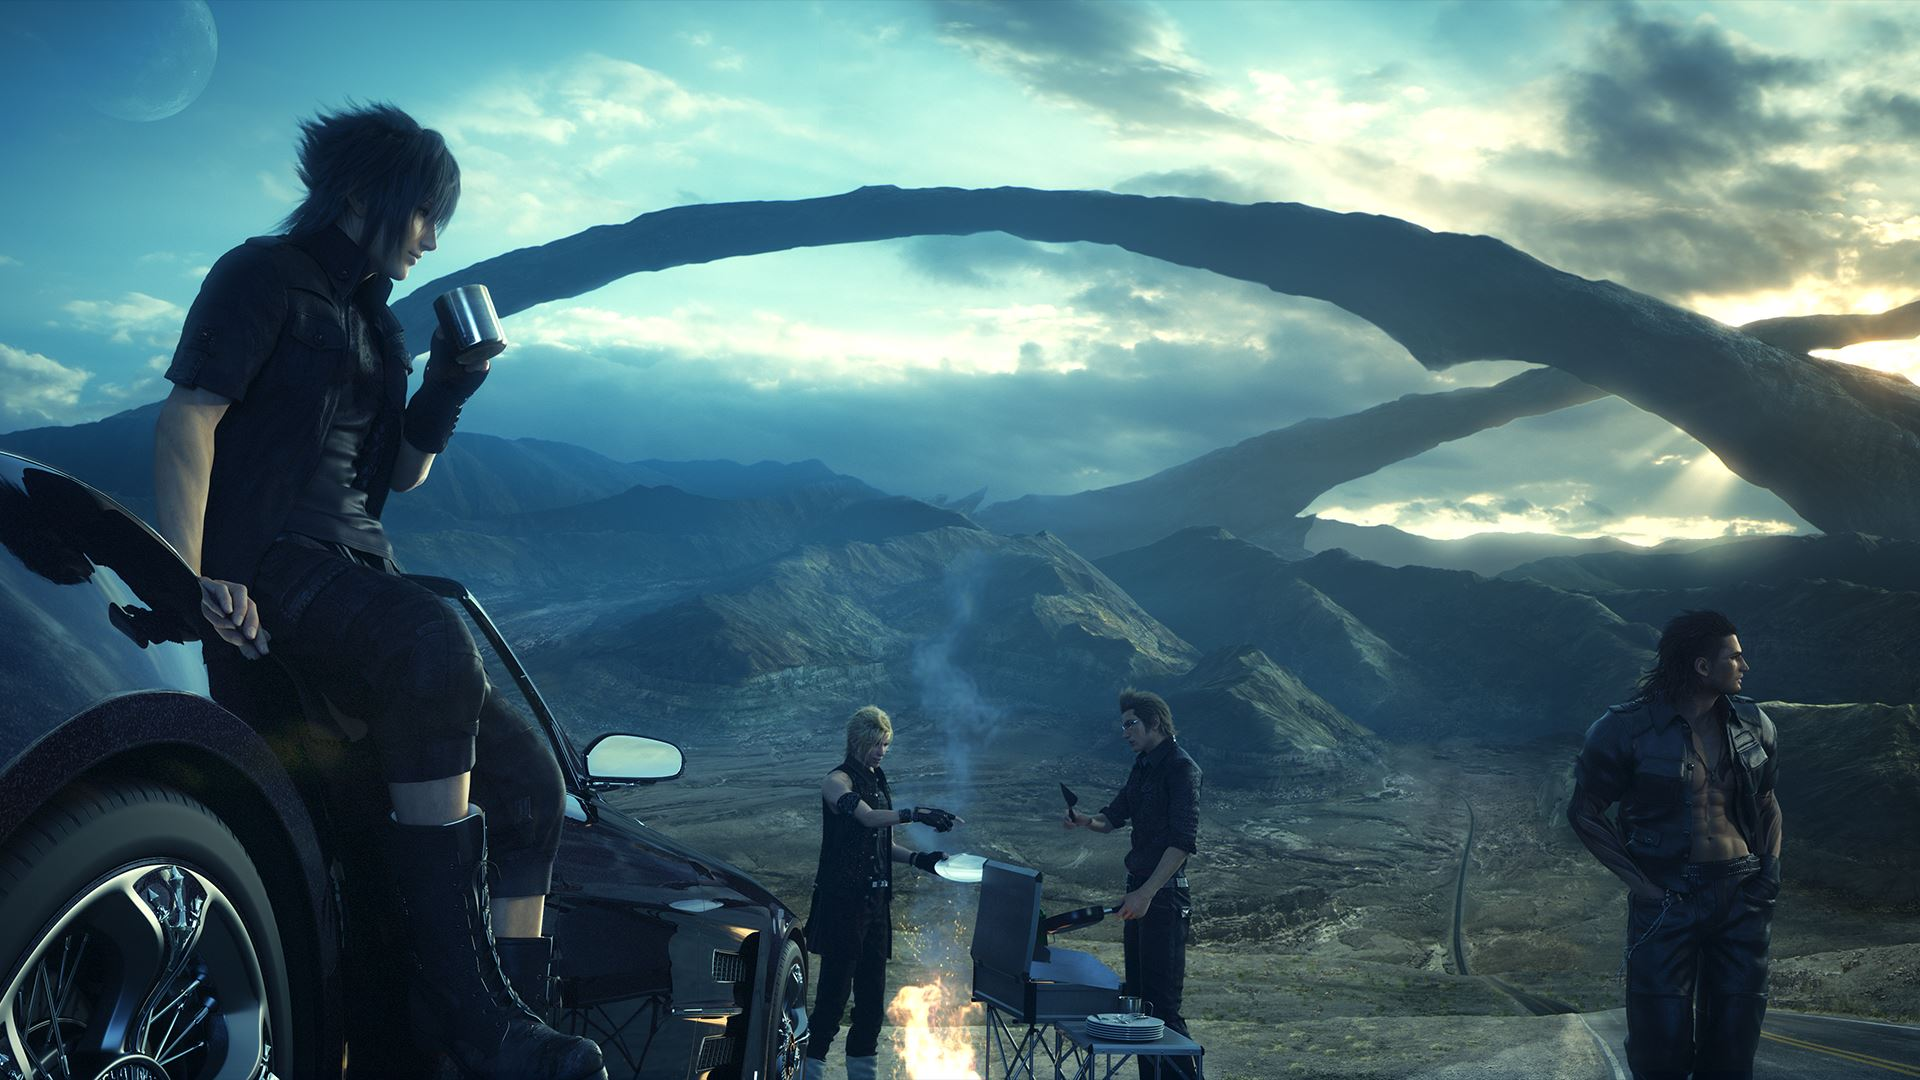 Amazon-Angebote am 8.3.: Final Fantasy XV PS4, Roccat Lua und Mauspad im Bundle